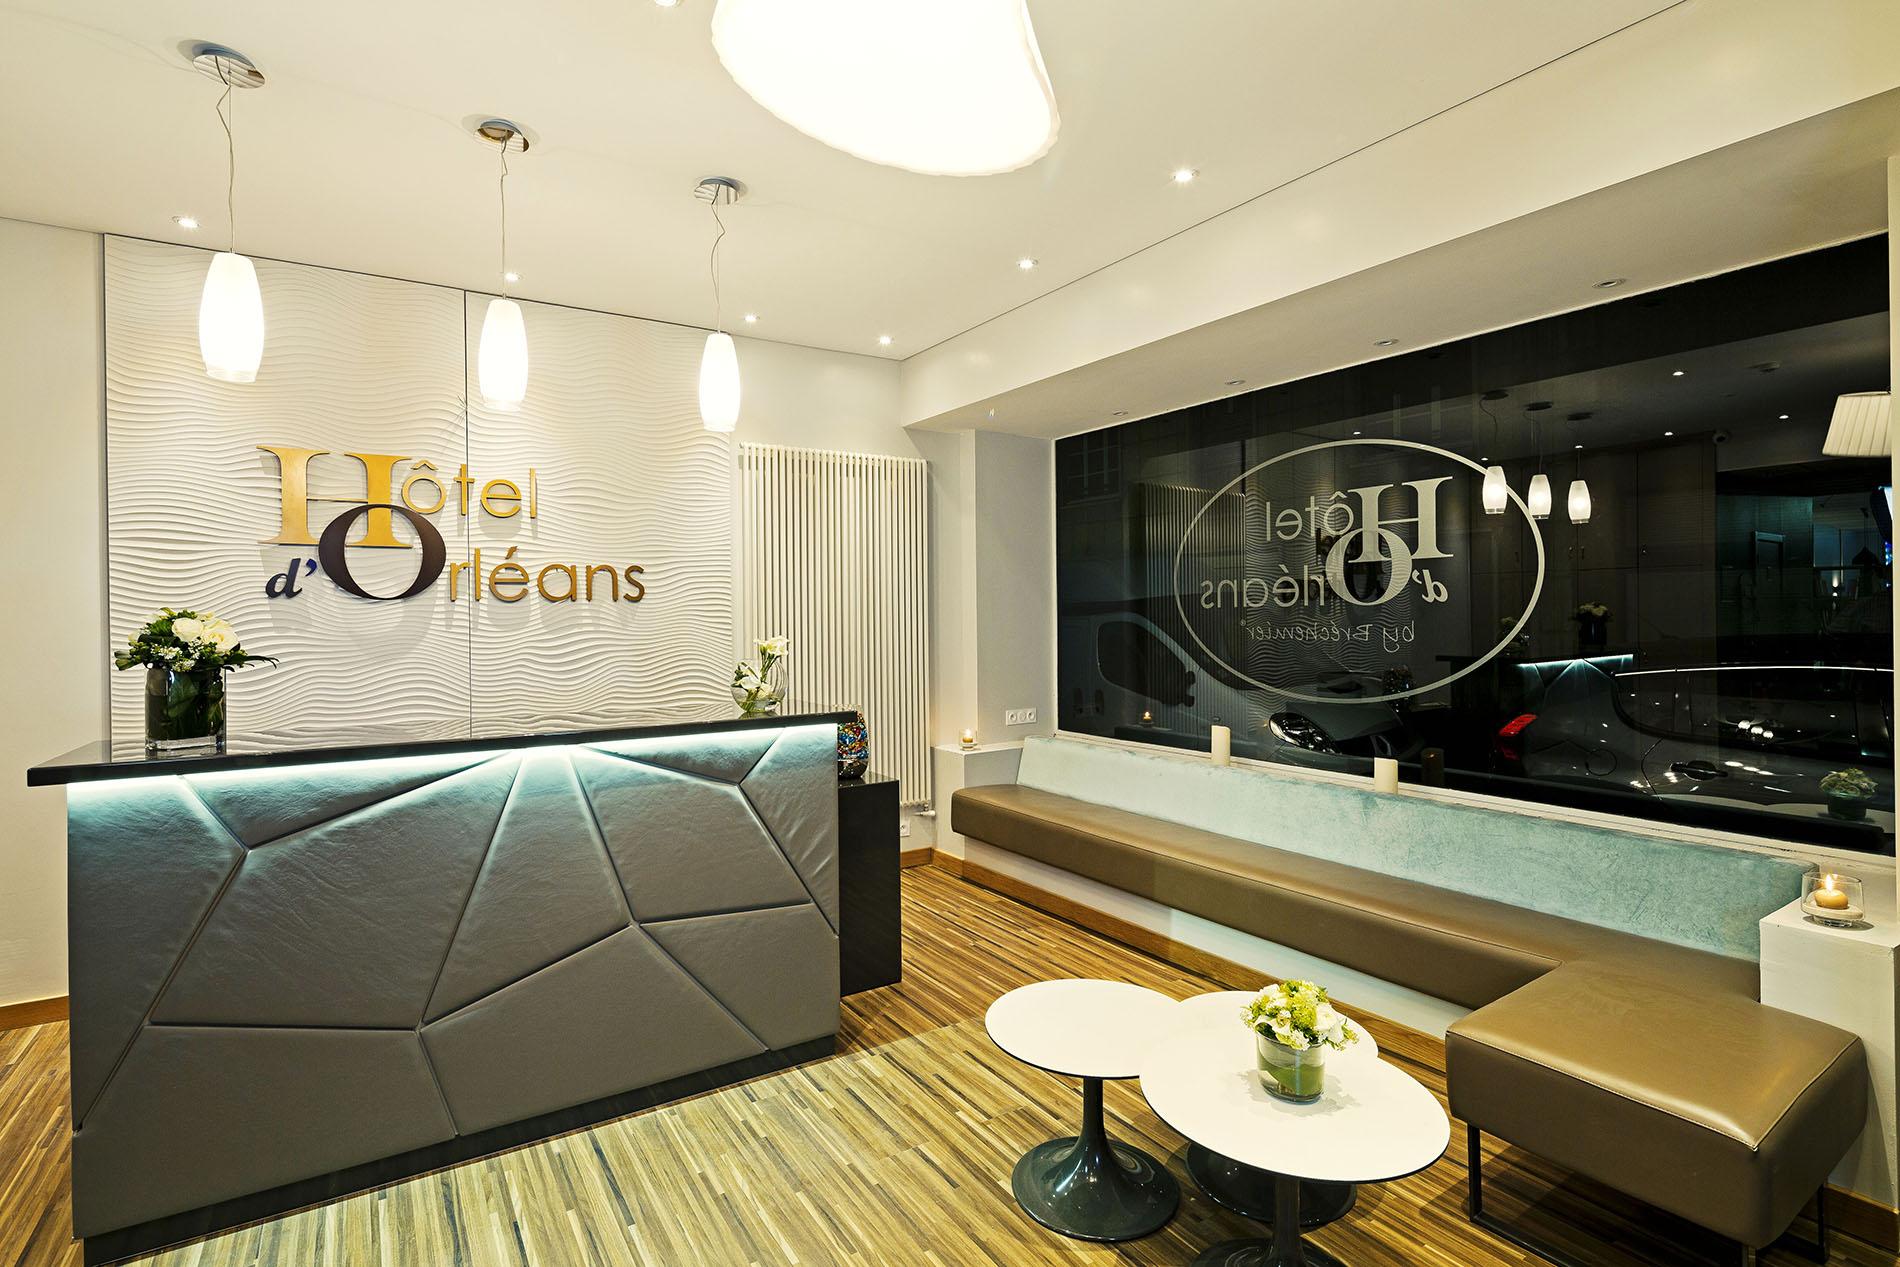 SIF_Hotel dOrleans_0